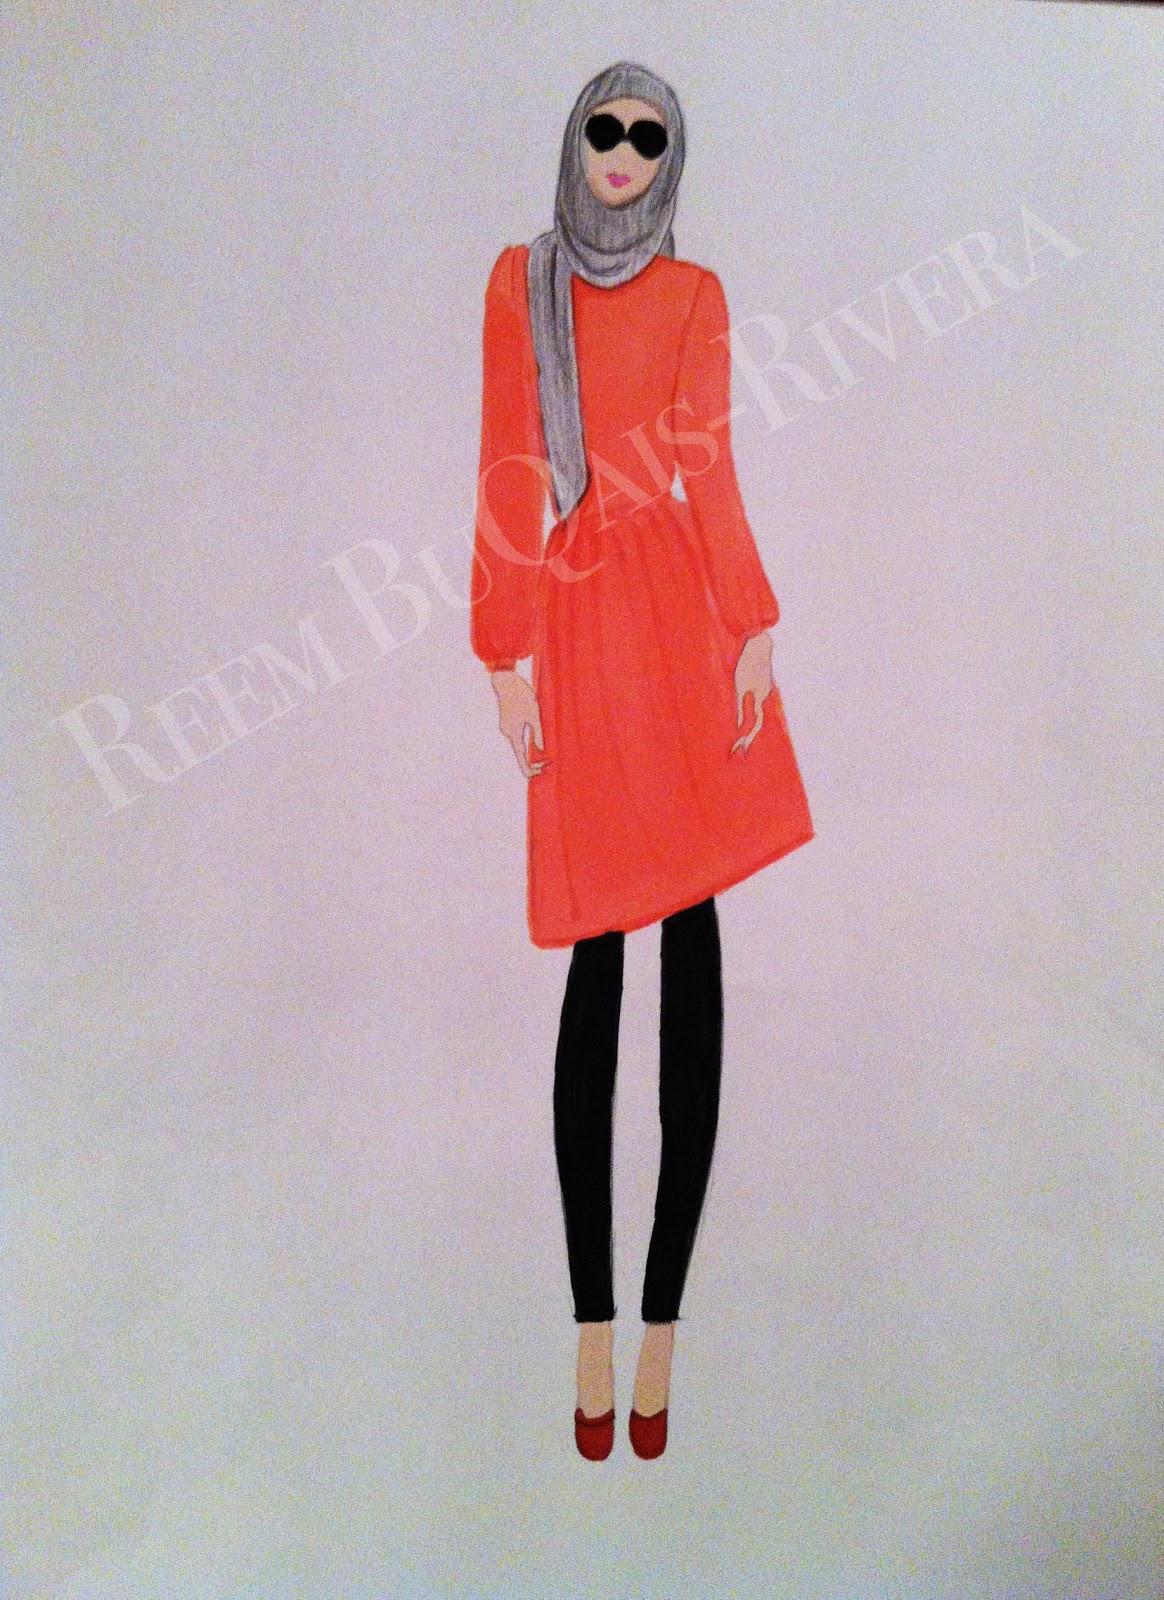 Piffy My First Hijab Fashion Illustration